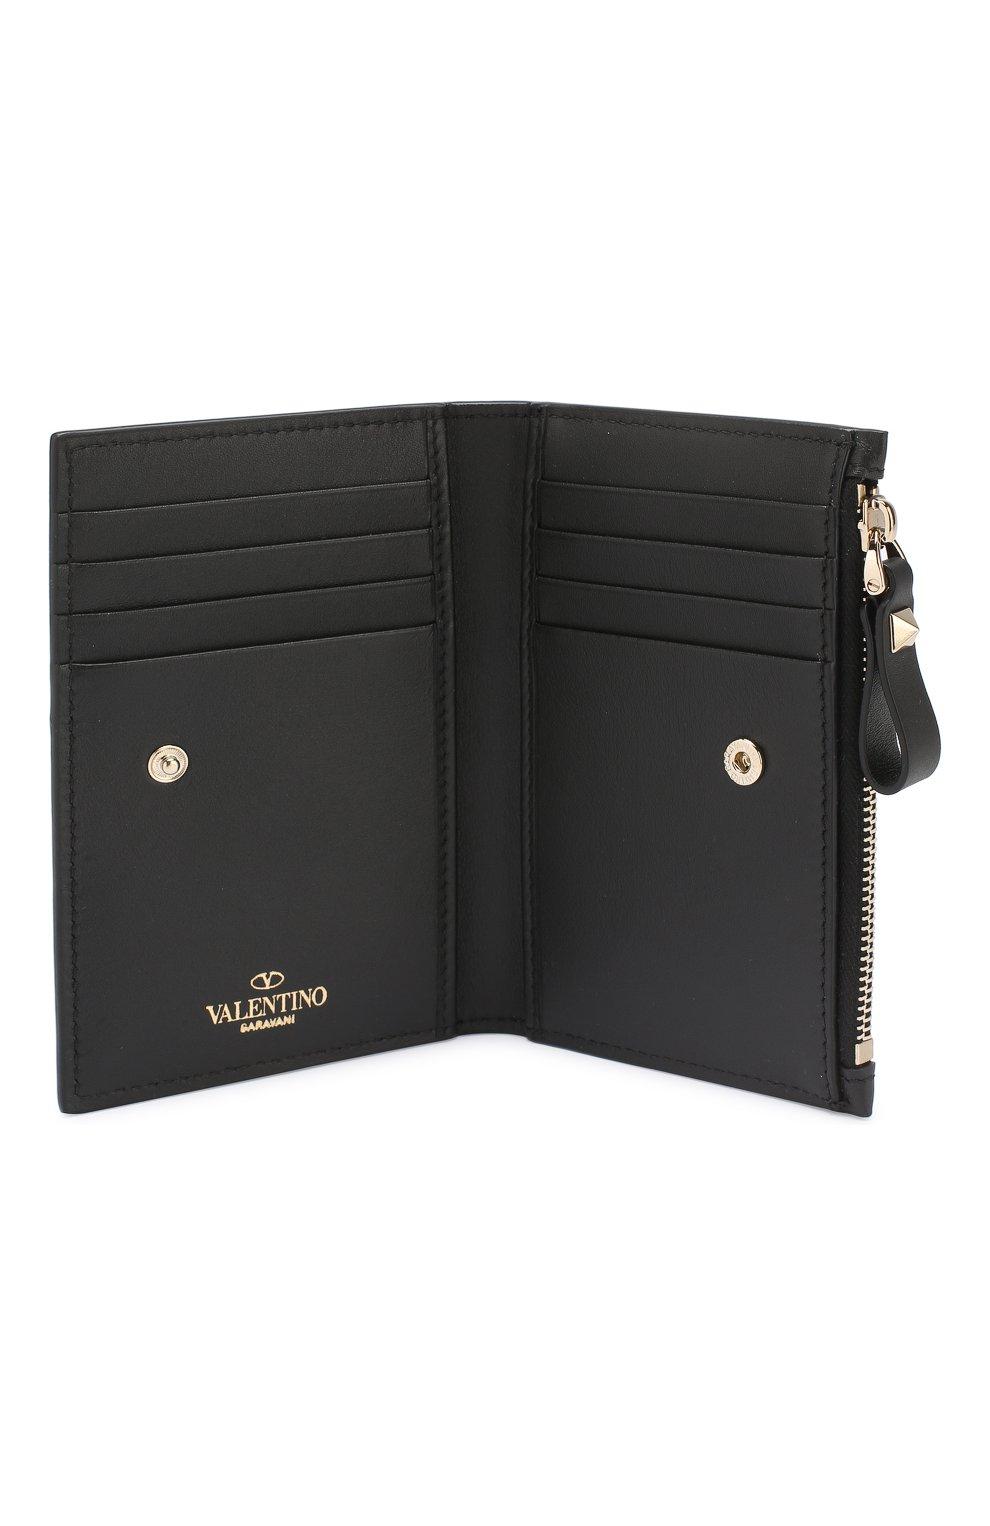 Футляр для кредитных карт Valentino Garavani VLTN Valentino черного цвета | Фото №3